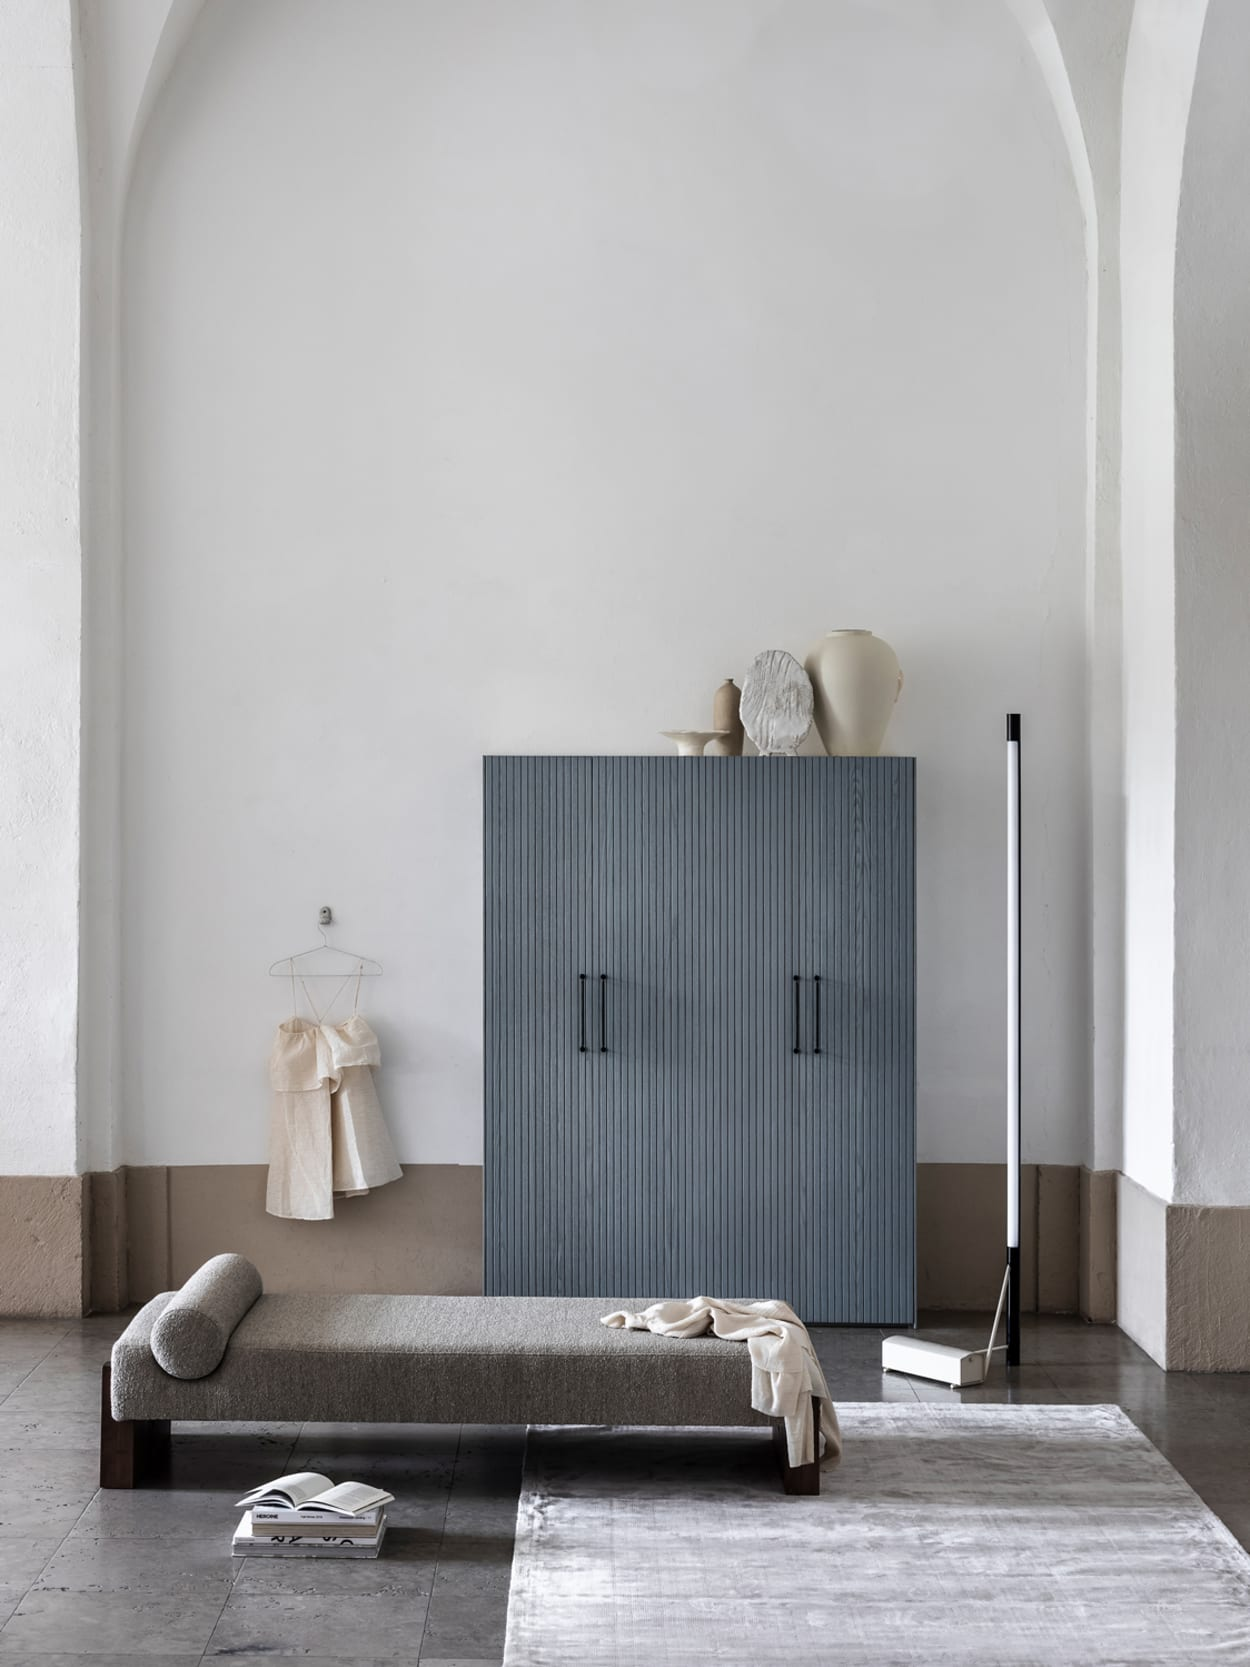 Superfront, Wood Collection, Ikea, Upcycling, Küchenfronten, Pax Türen